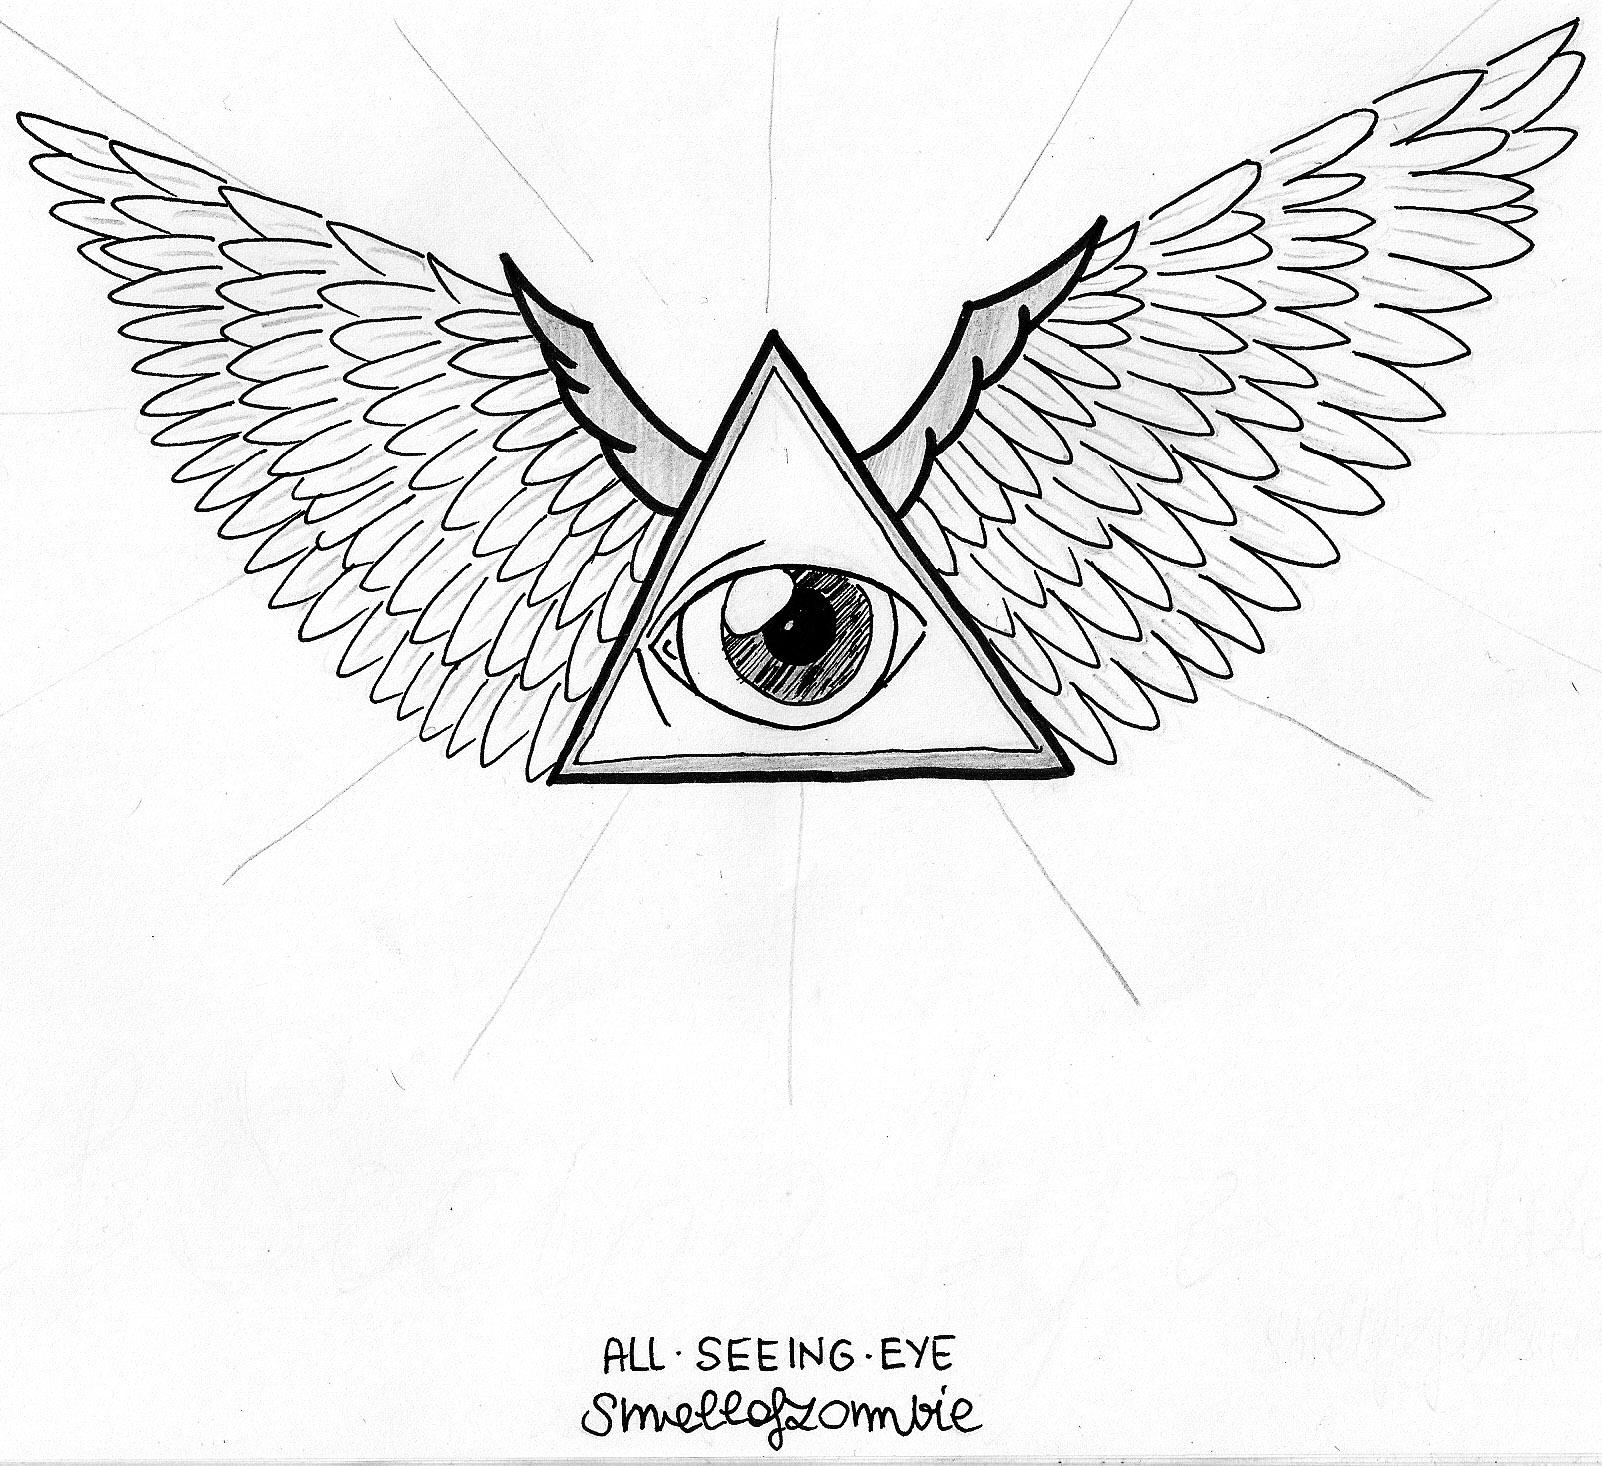 All Seeing Eye By Smellofzombie On DeviantArt